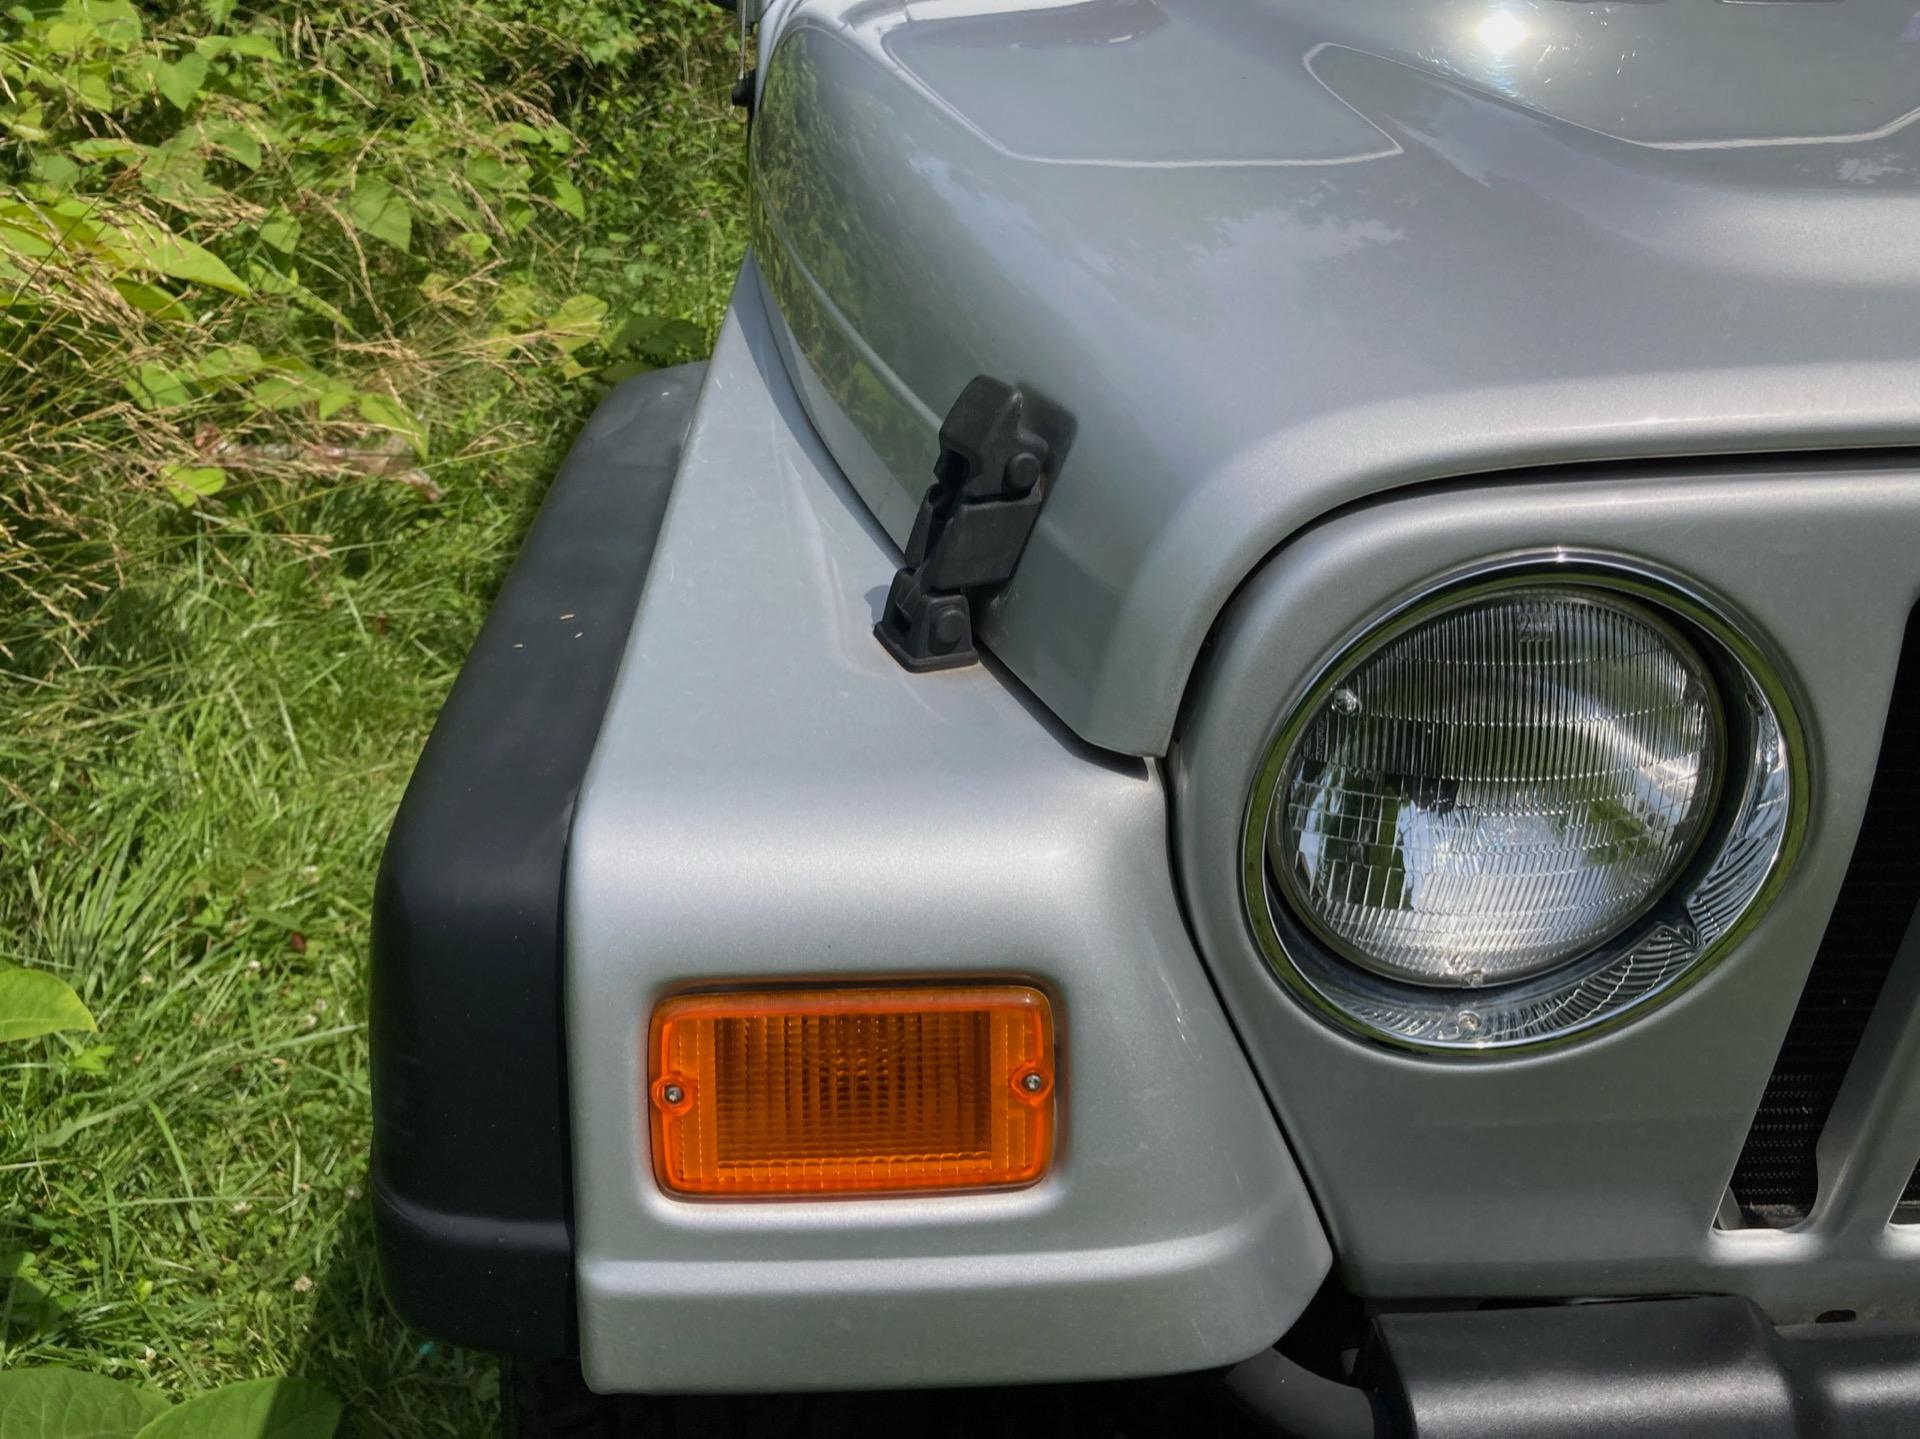 Used-2003-Jeep-Wrangler-X-Automatic-